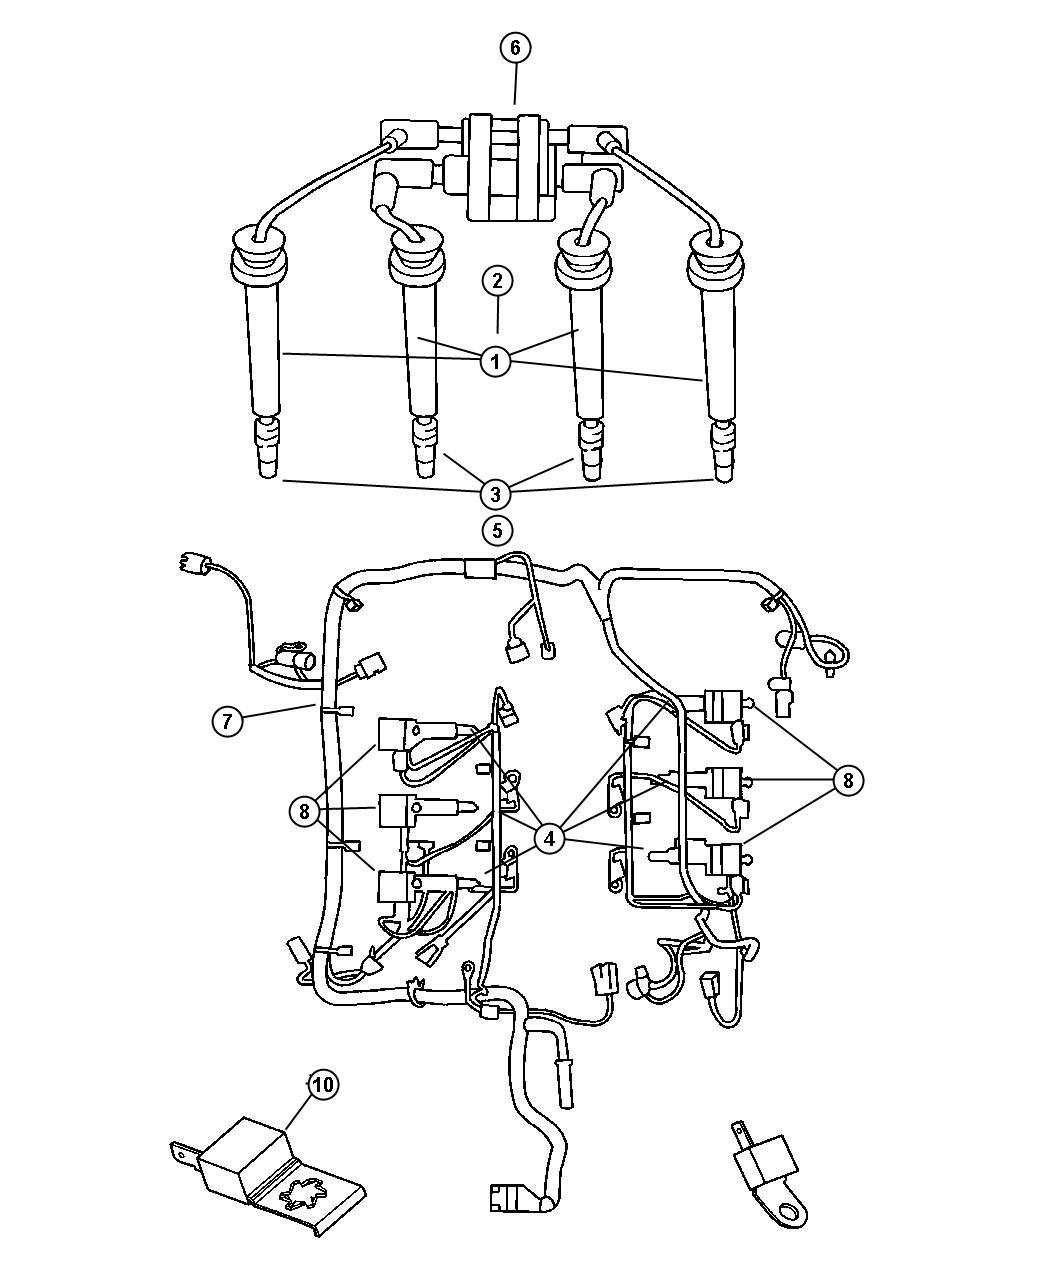 2009 chevrolet silverado 2500 evaporator and heater parts diagram besides chrysler 300 wiring diagram further 2002